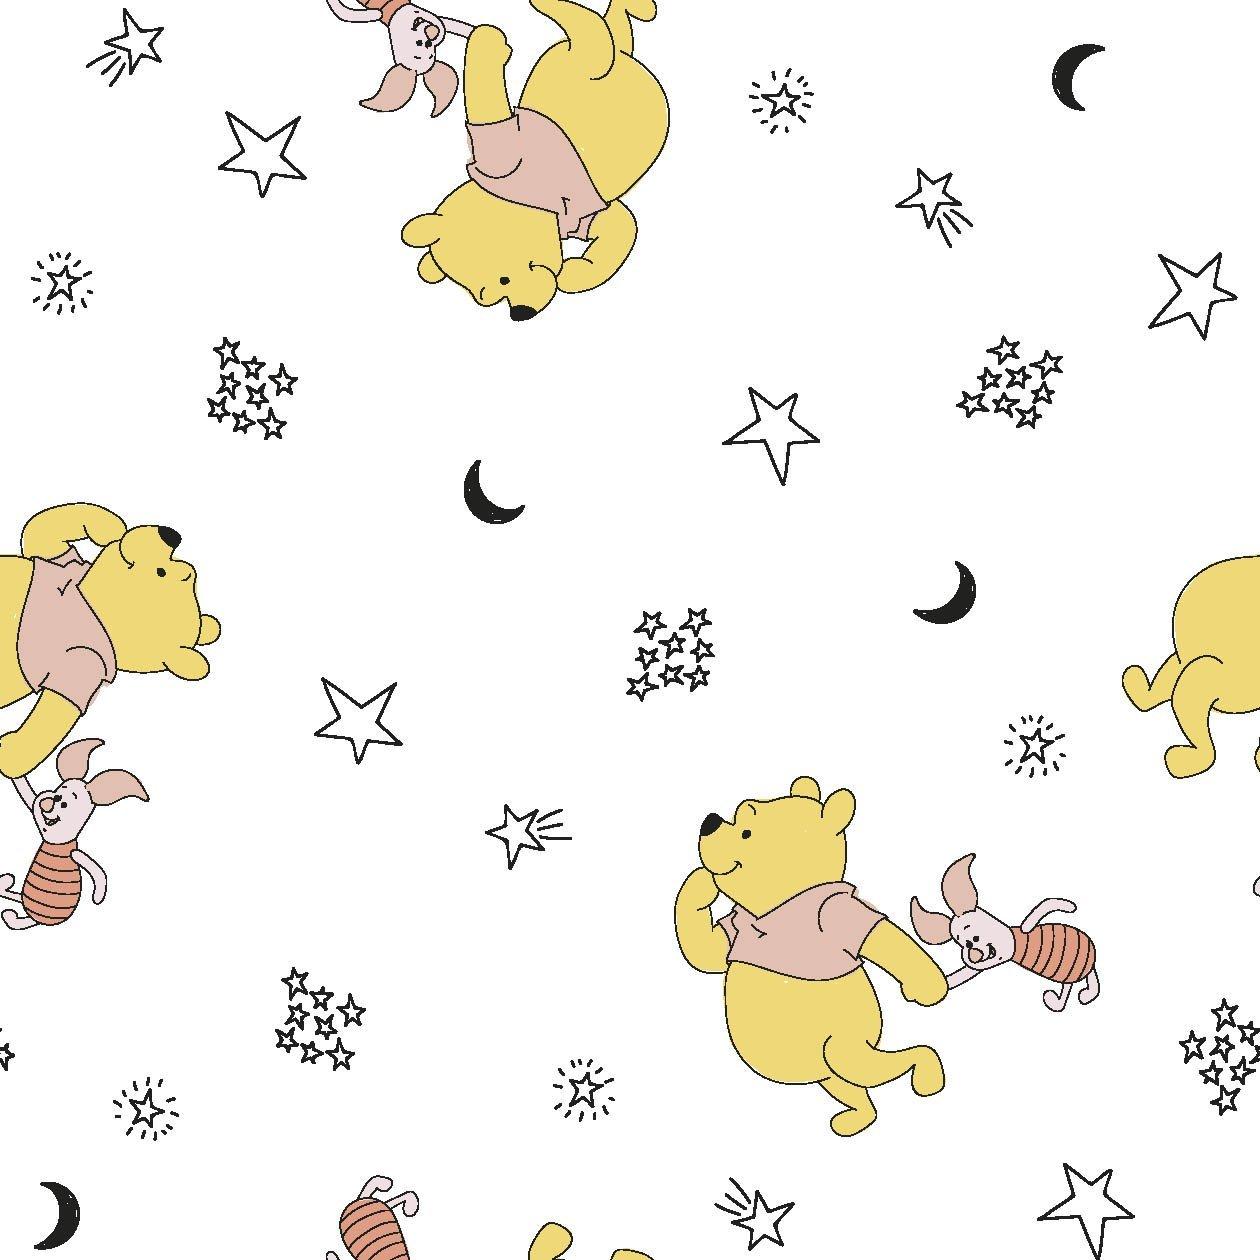 Disney Pooh 73284 Pooh & Piglet Stars